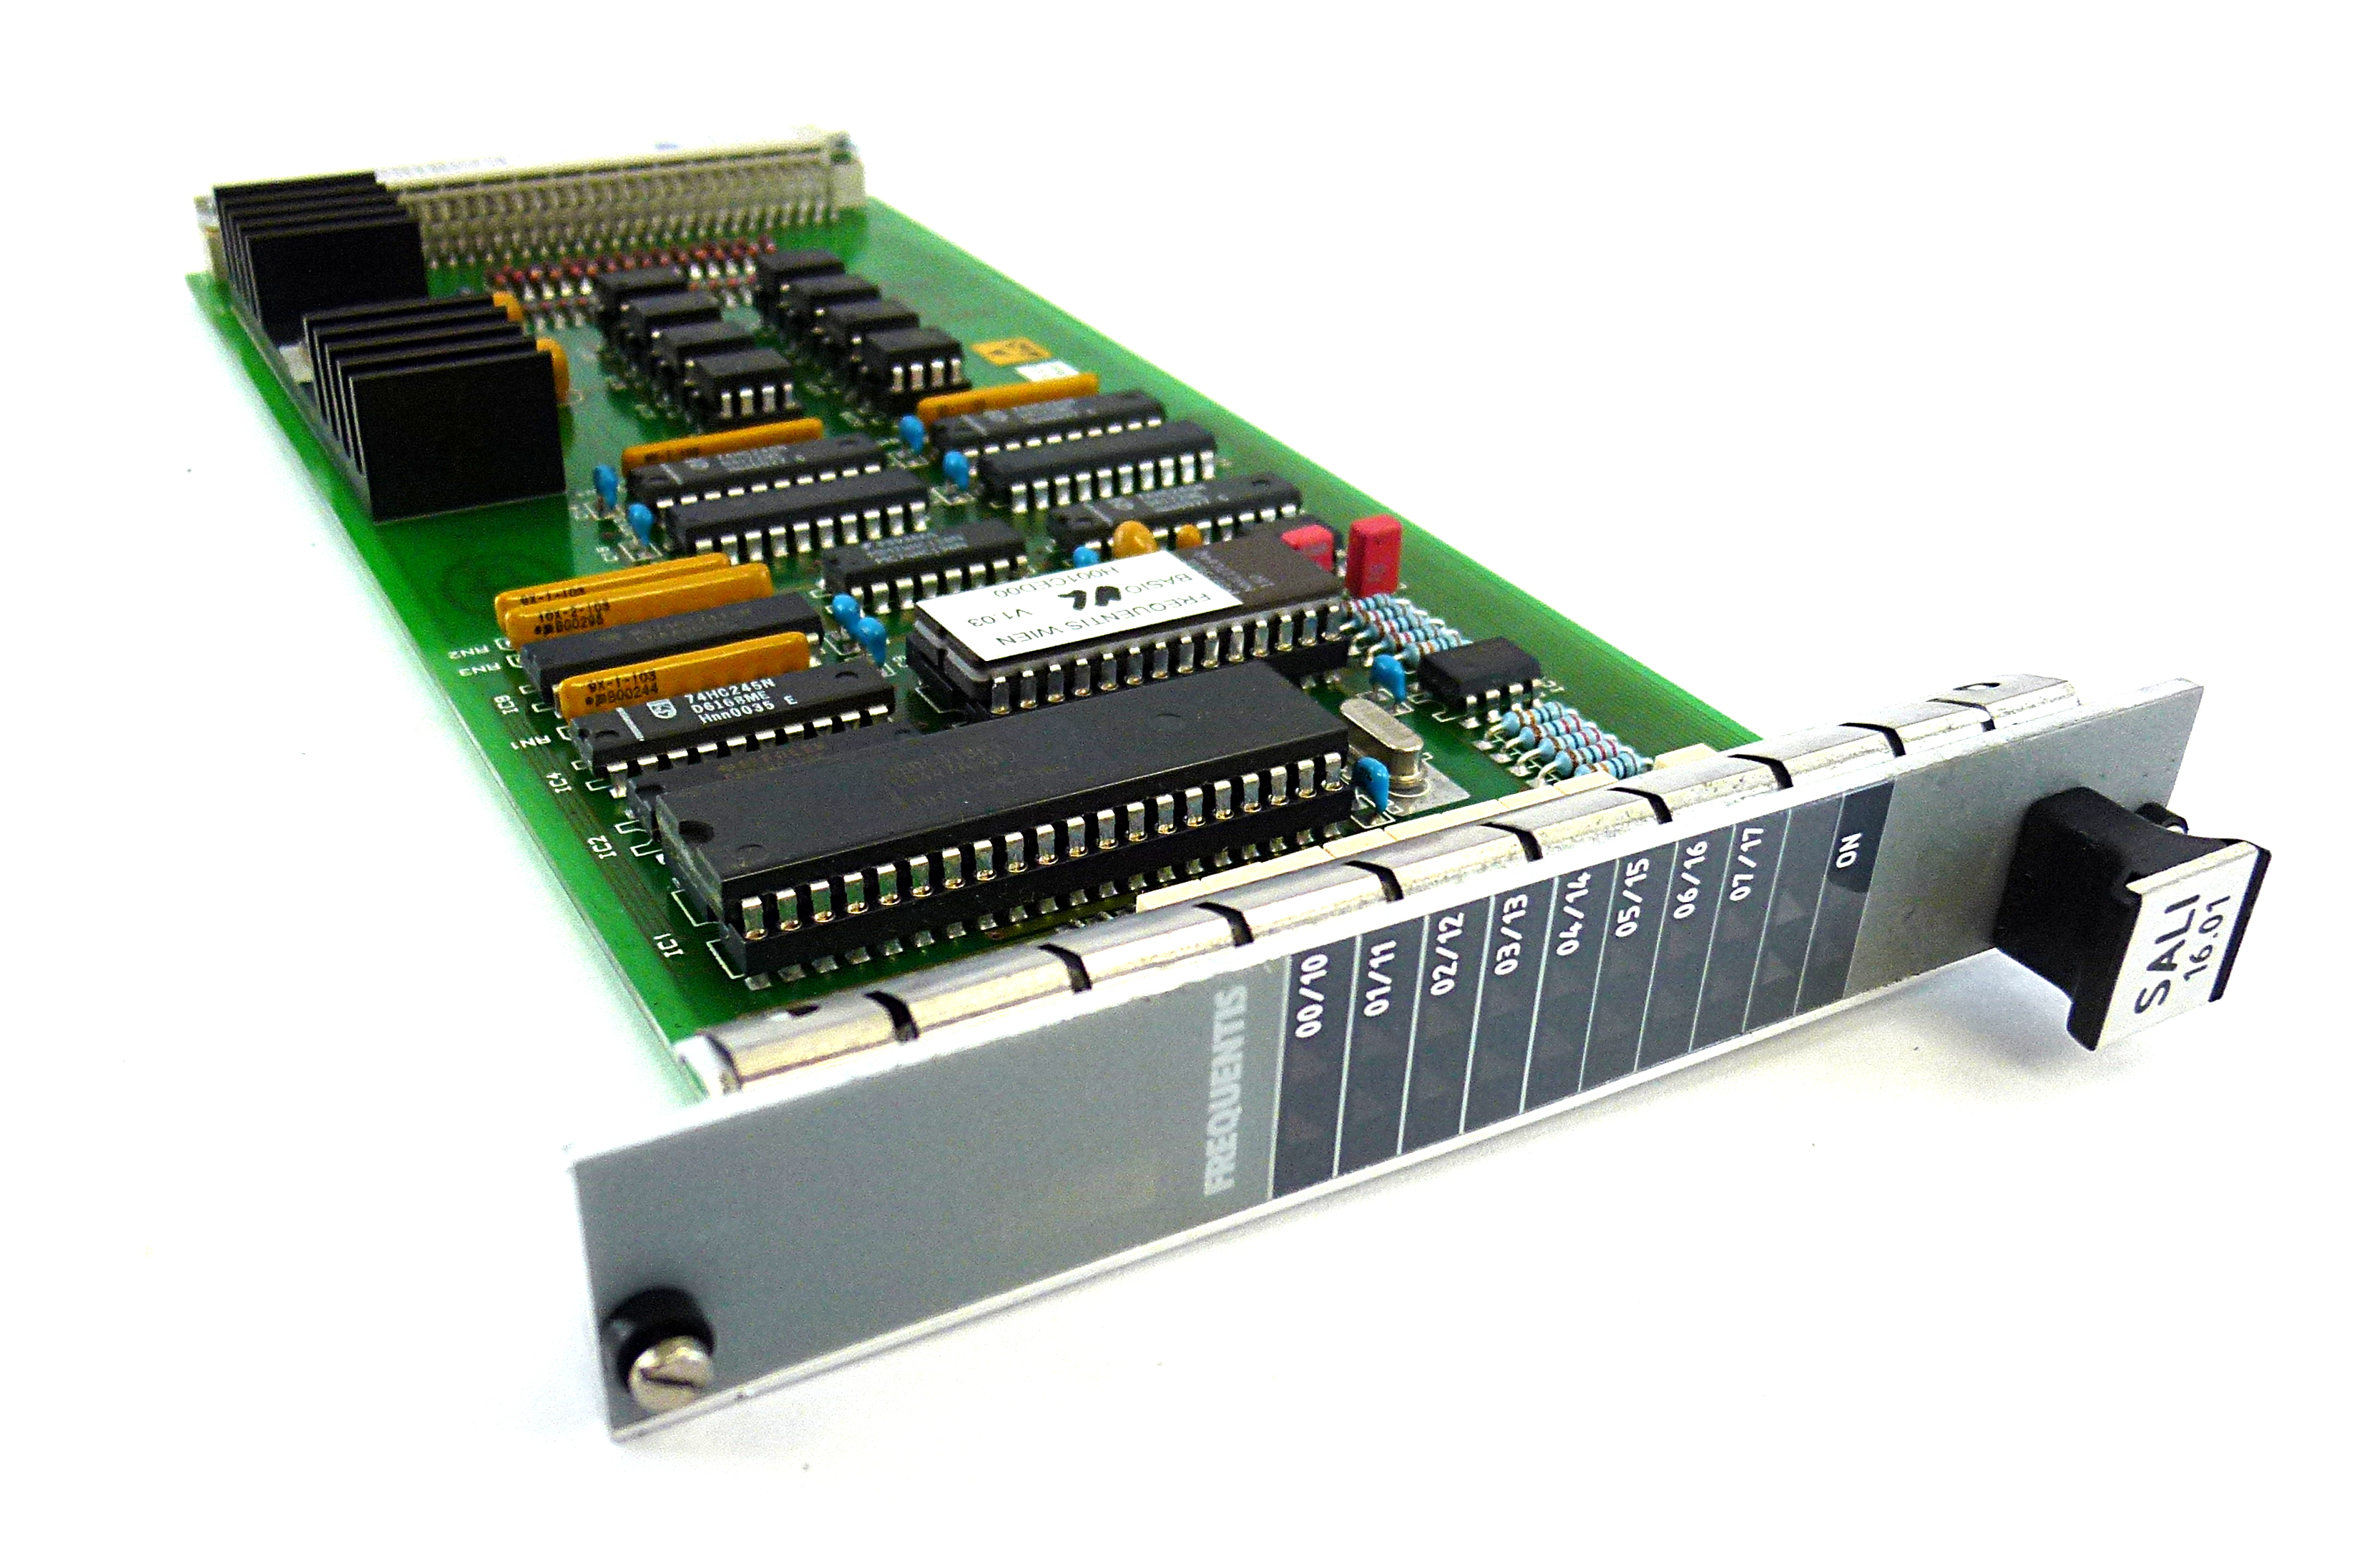 Frequentis SALI 16.01 BGT Data 706619 Communication Module